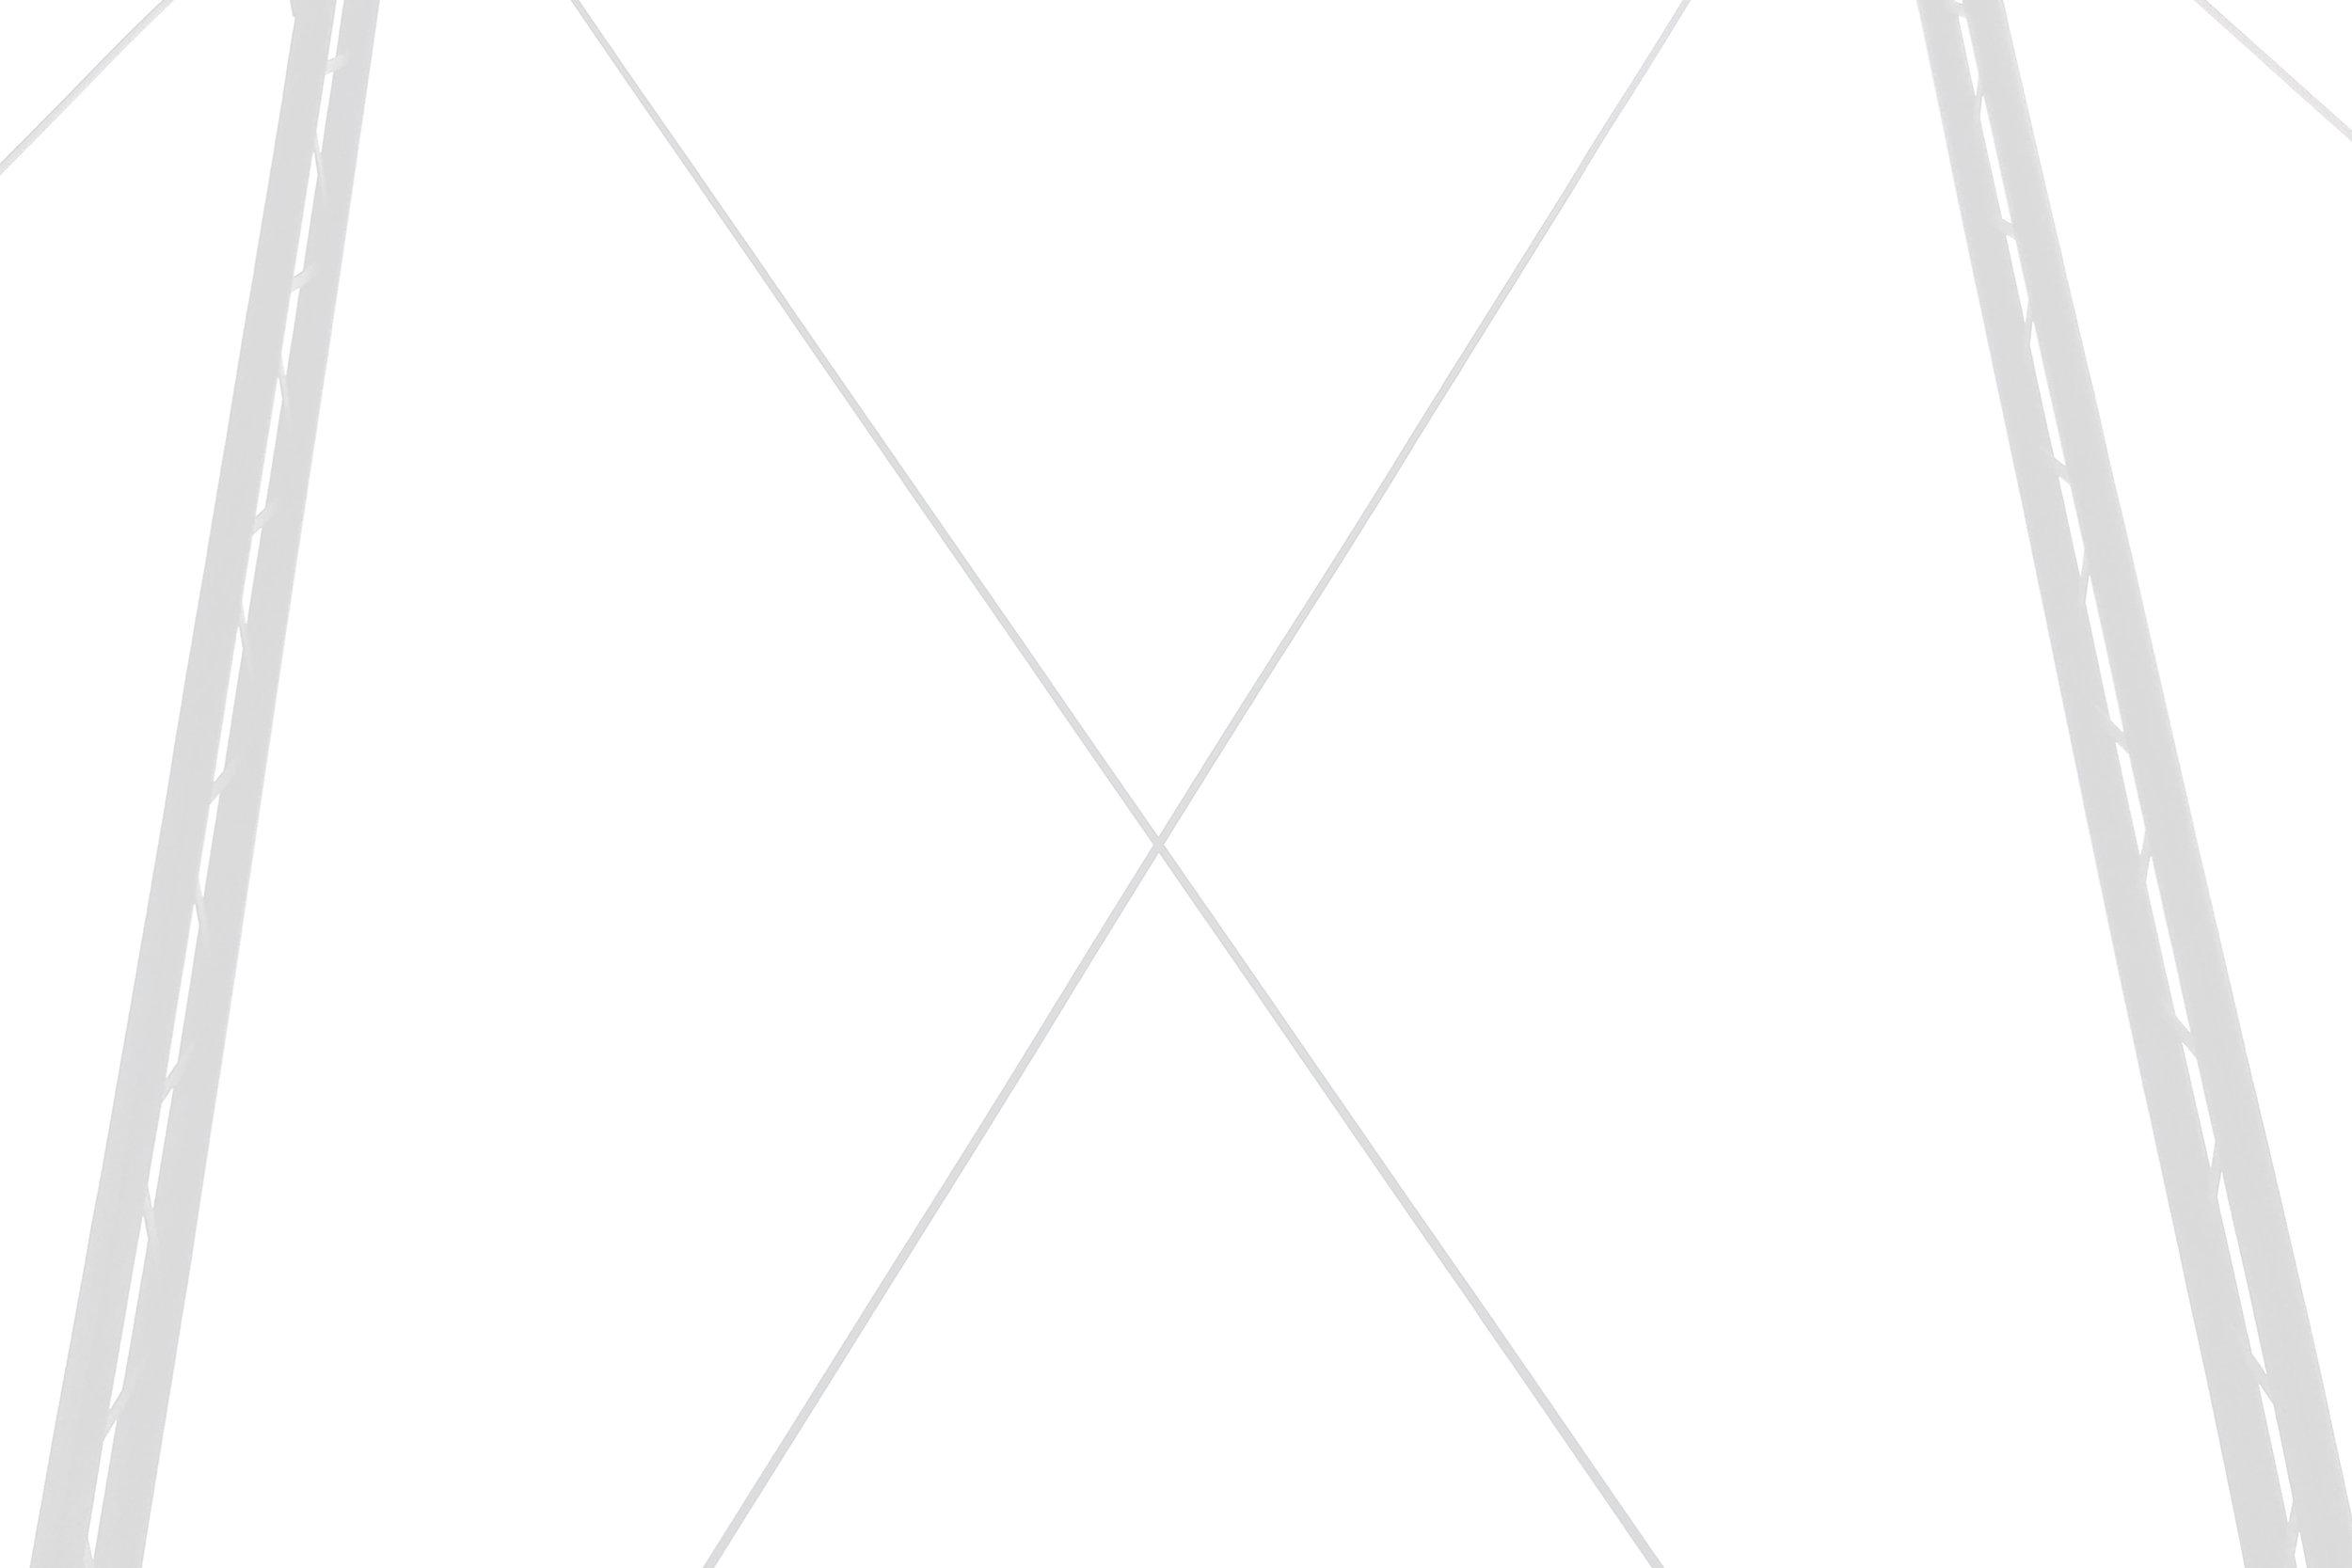 SkyLines_11_Final.jpg